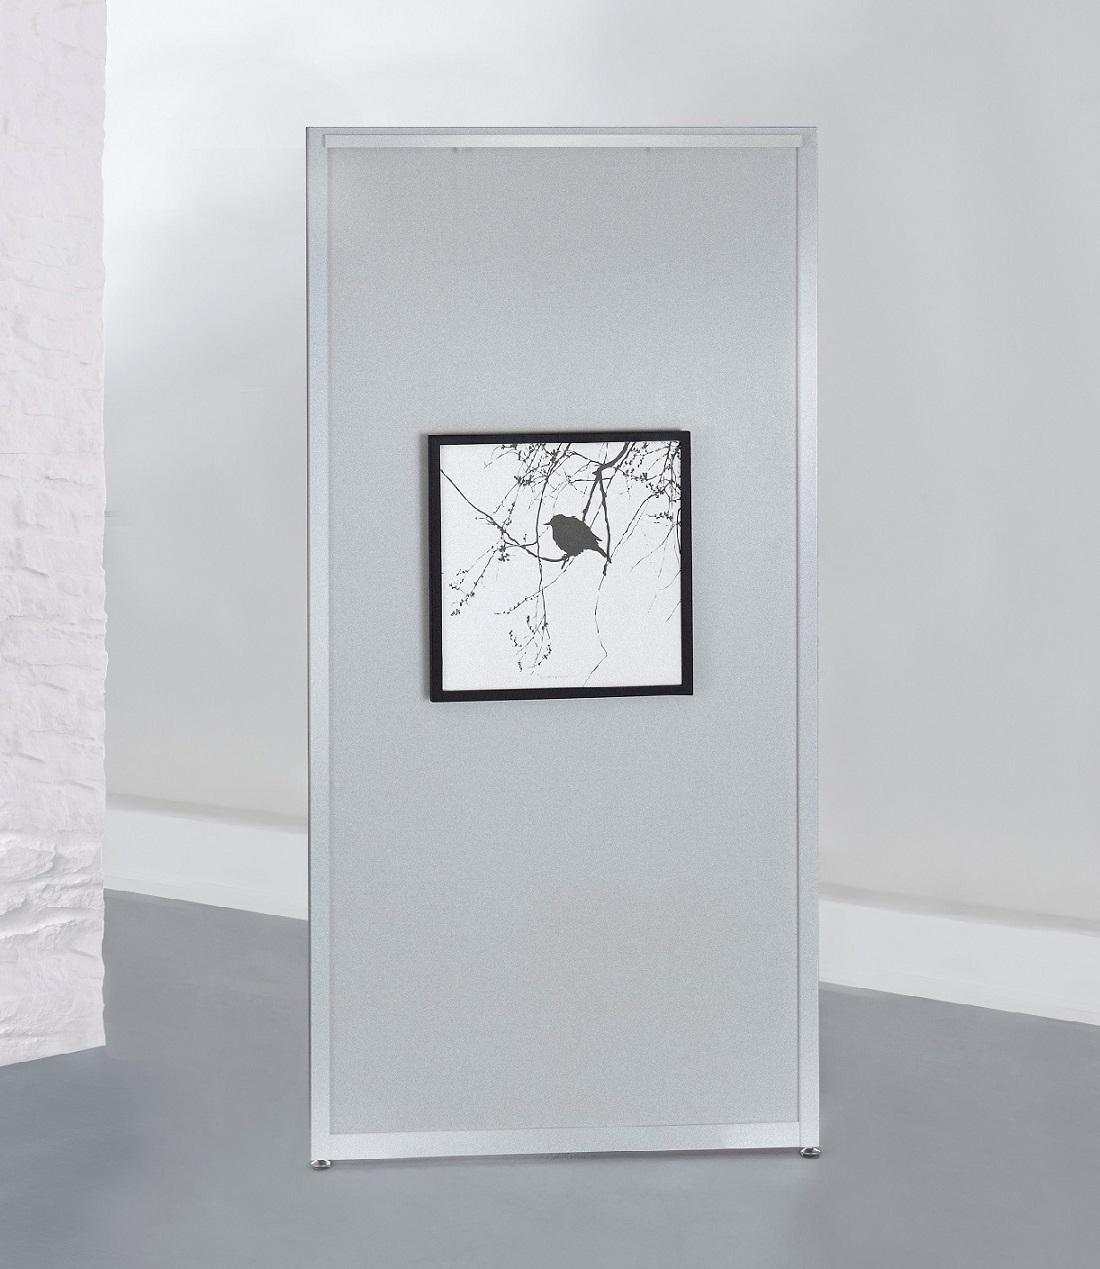 Stellwandmodul 'Screen Art' in Dekor silber und den Maßen 60 x 198 cm